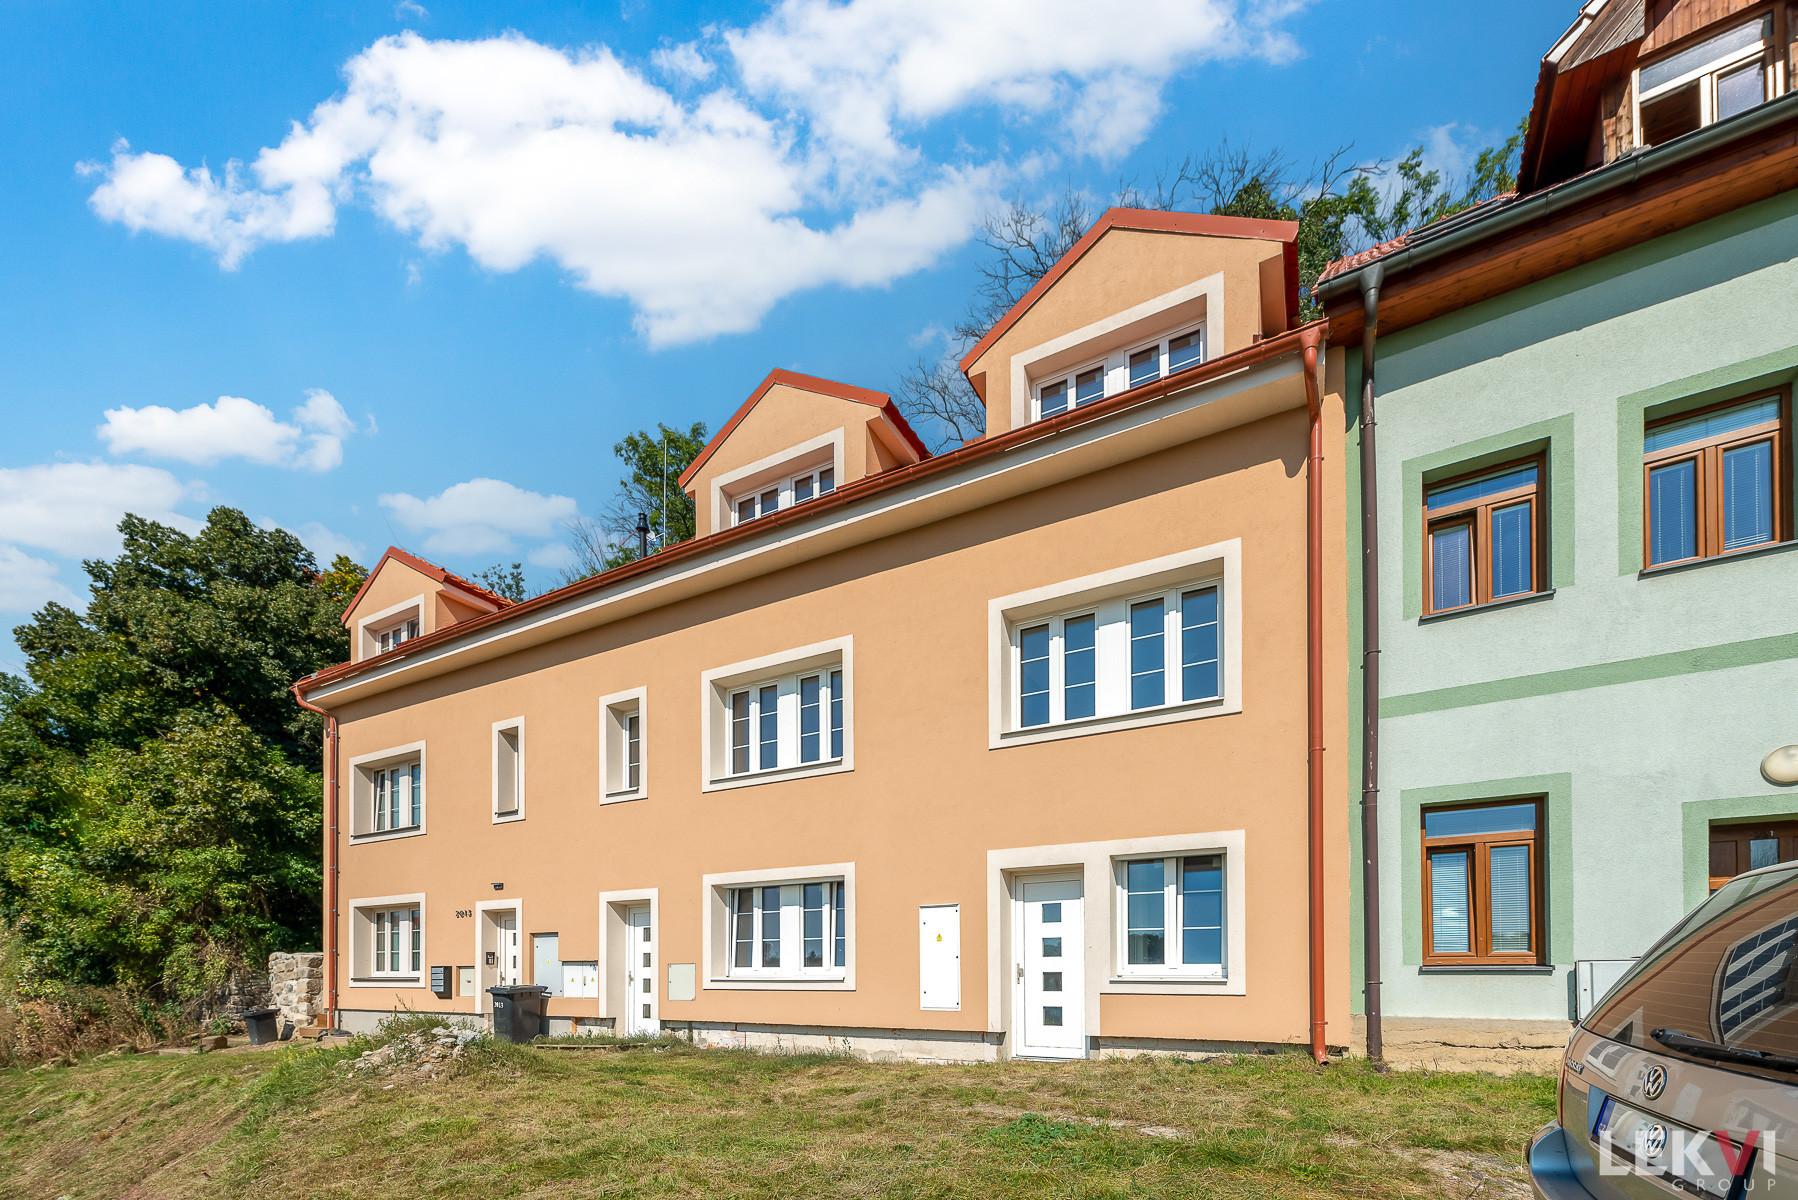 Prodej bytu 1+kk, 40 m2 - Pod Horou, Kladno